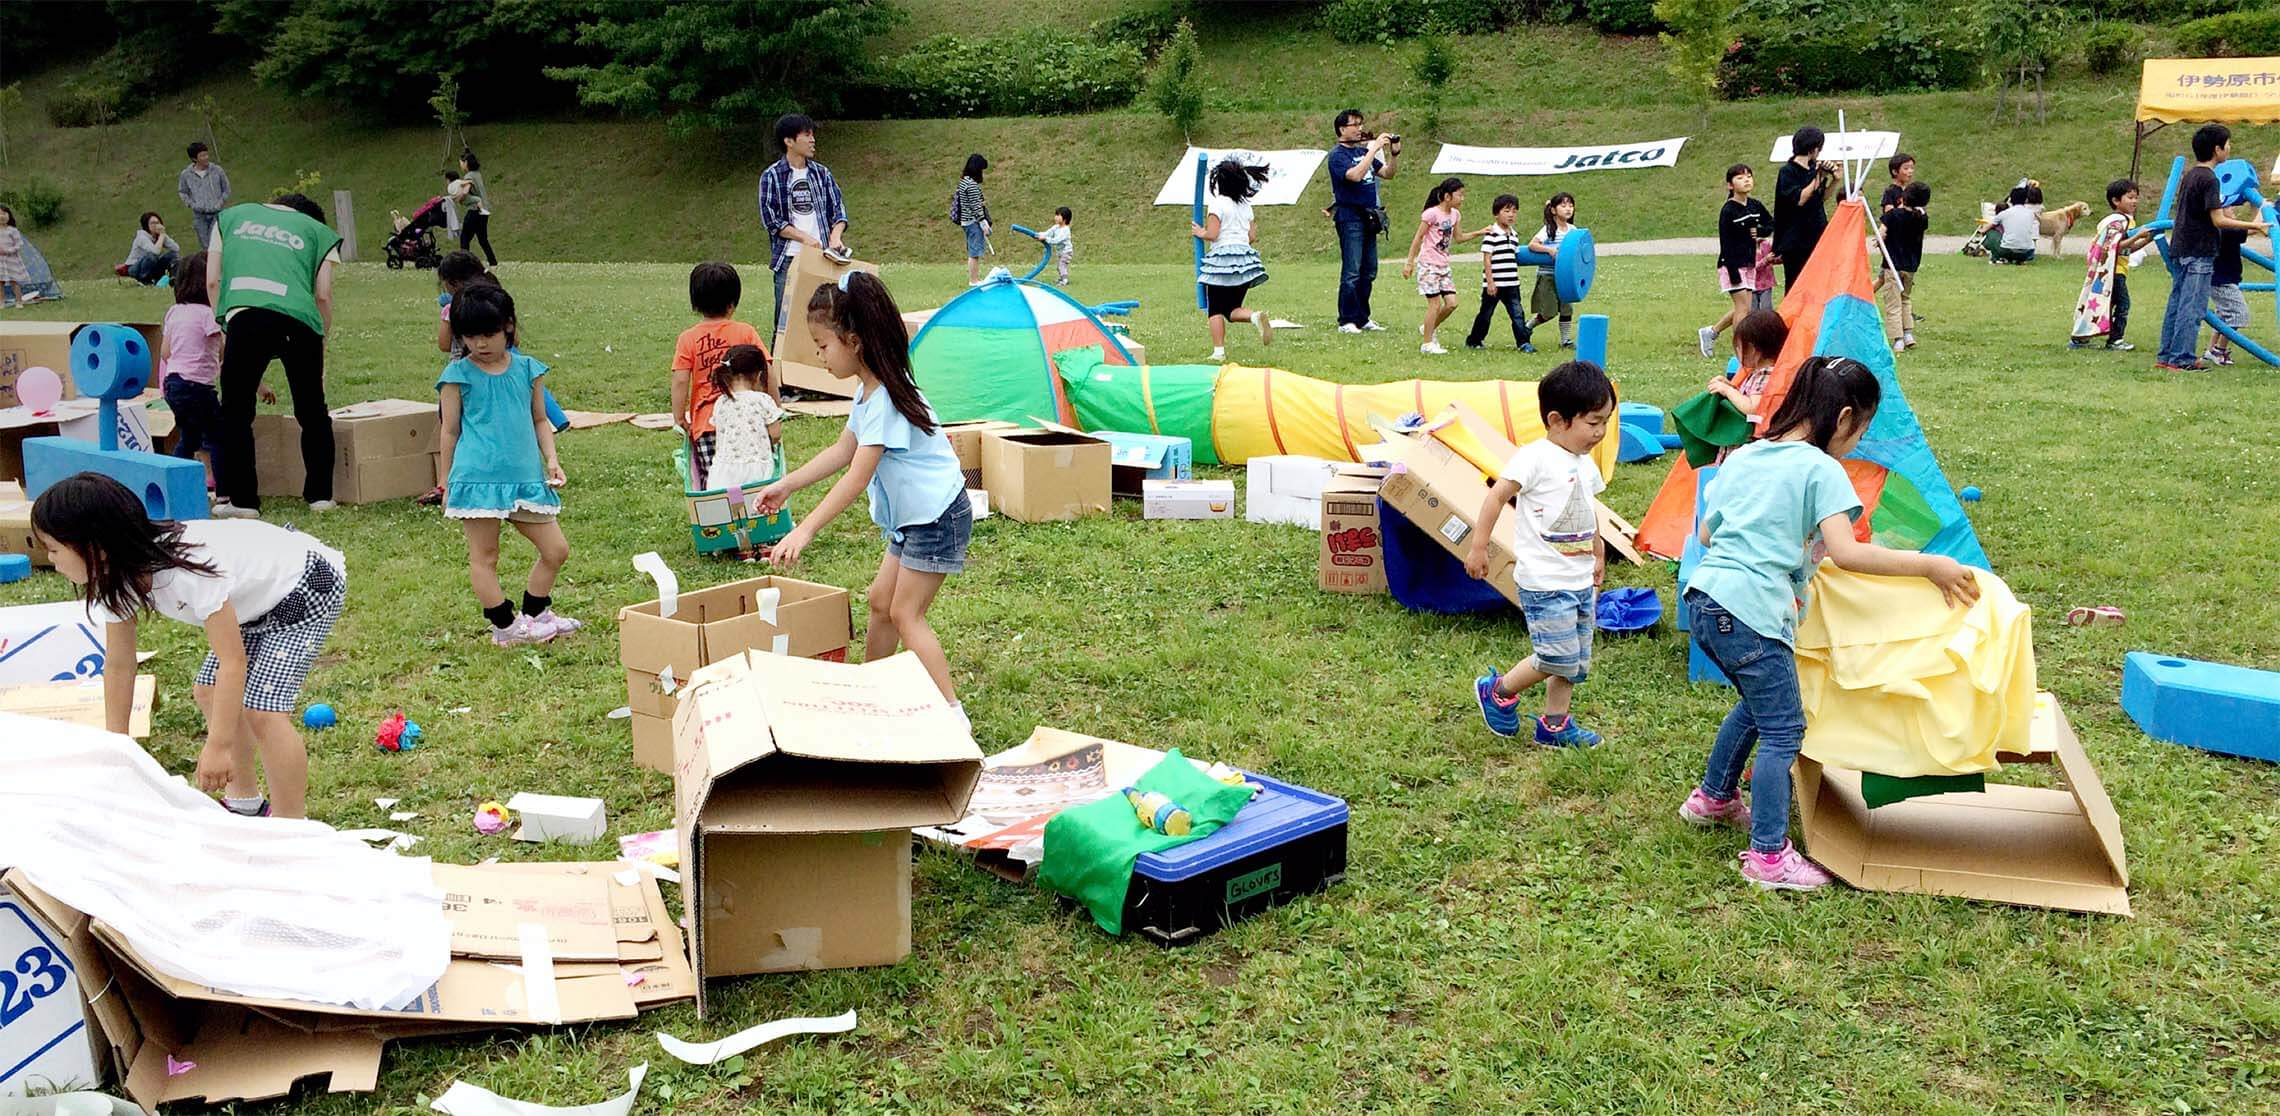 Free Play Festival